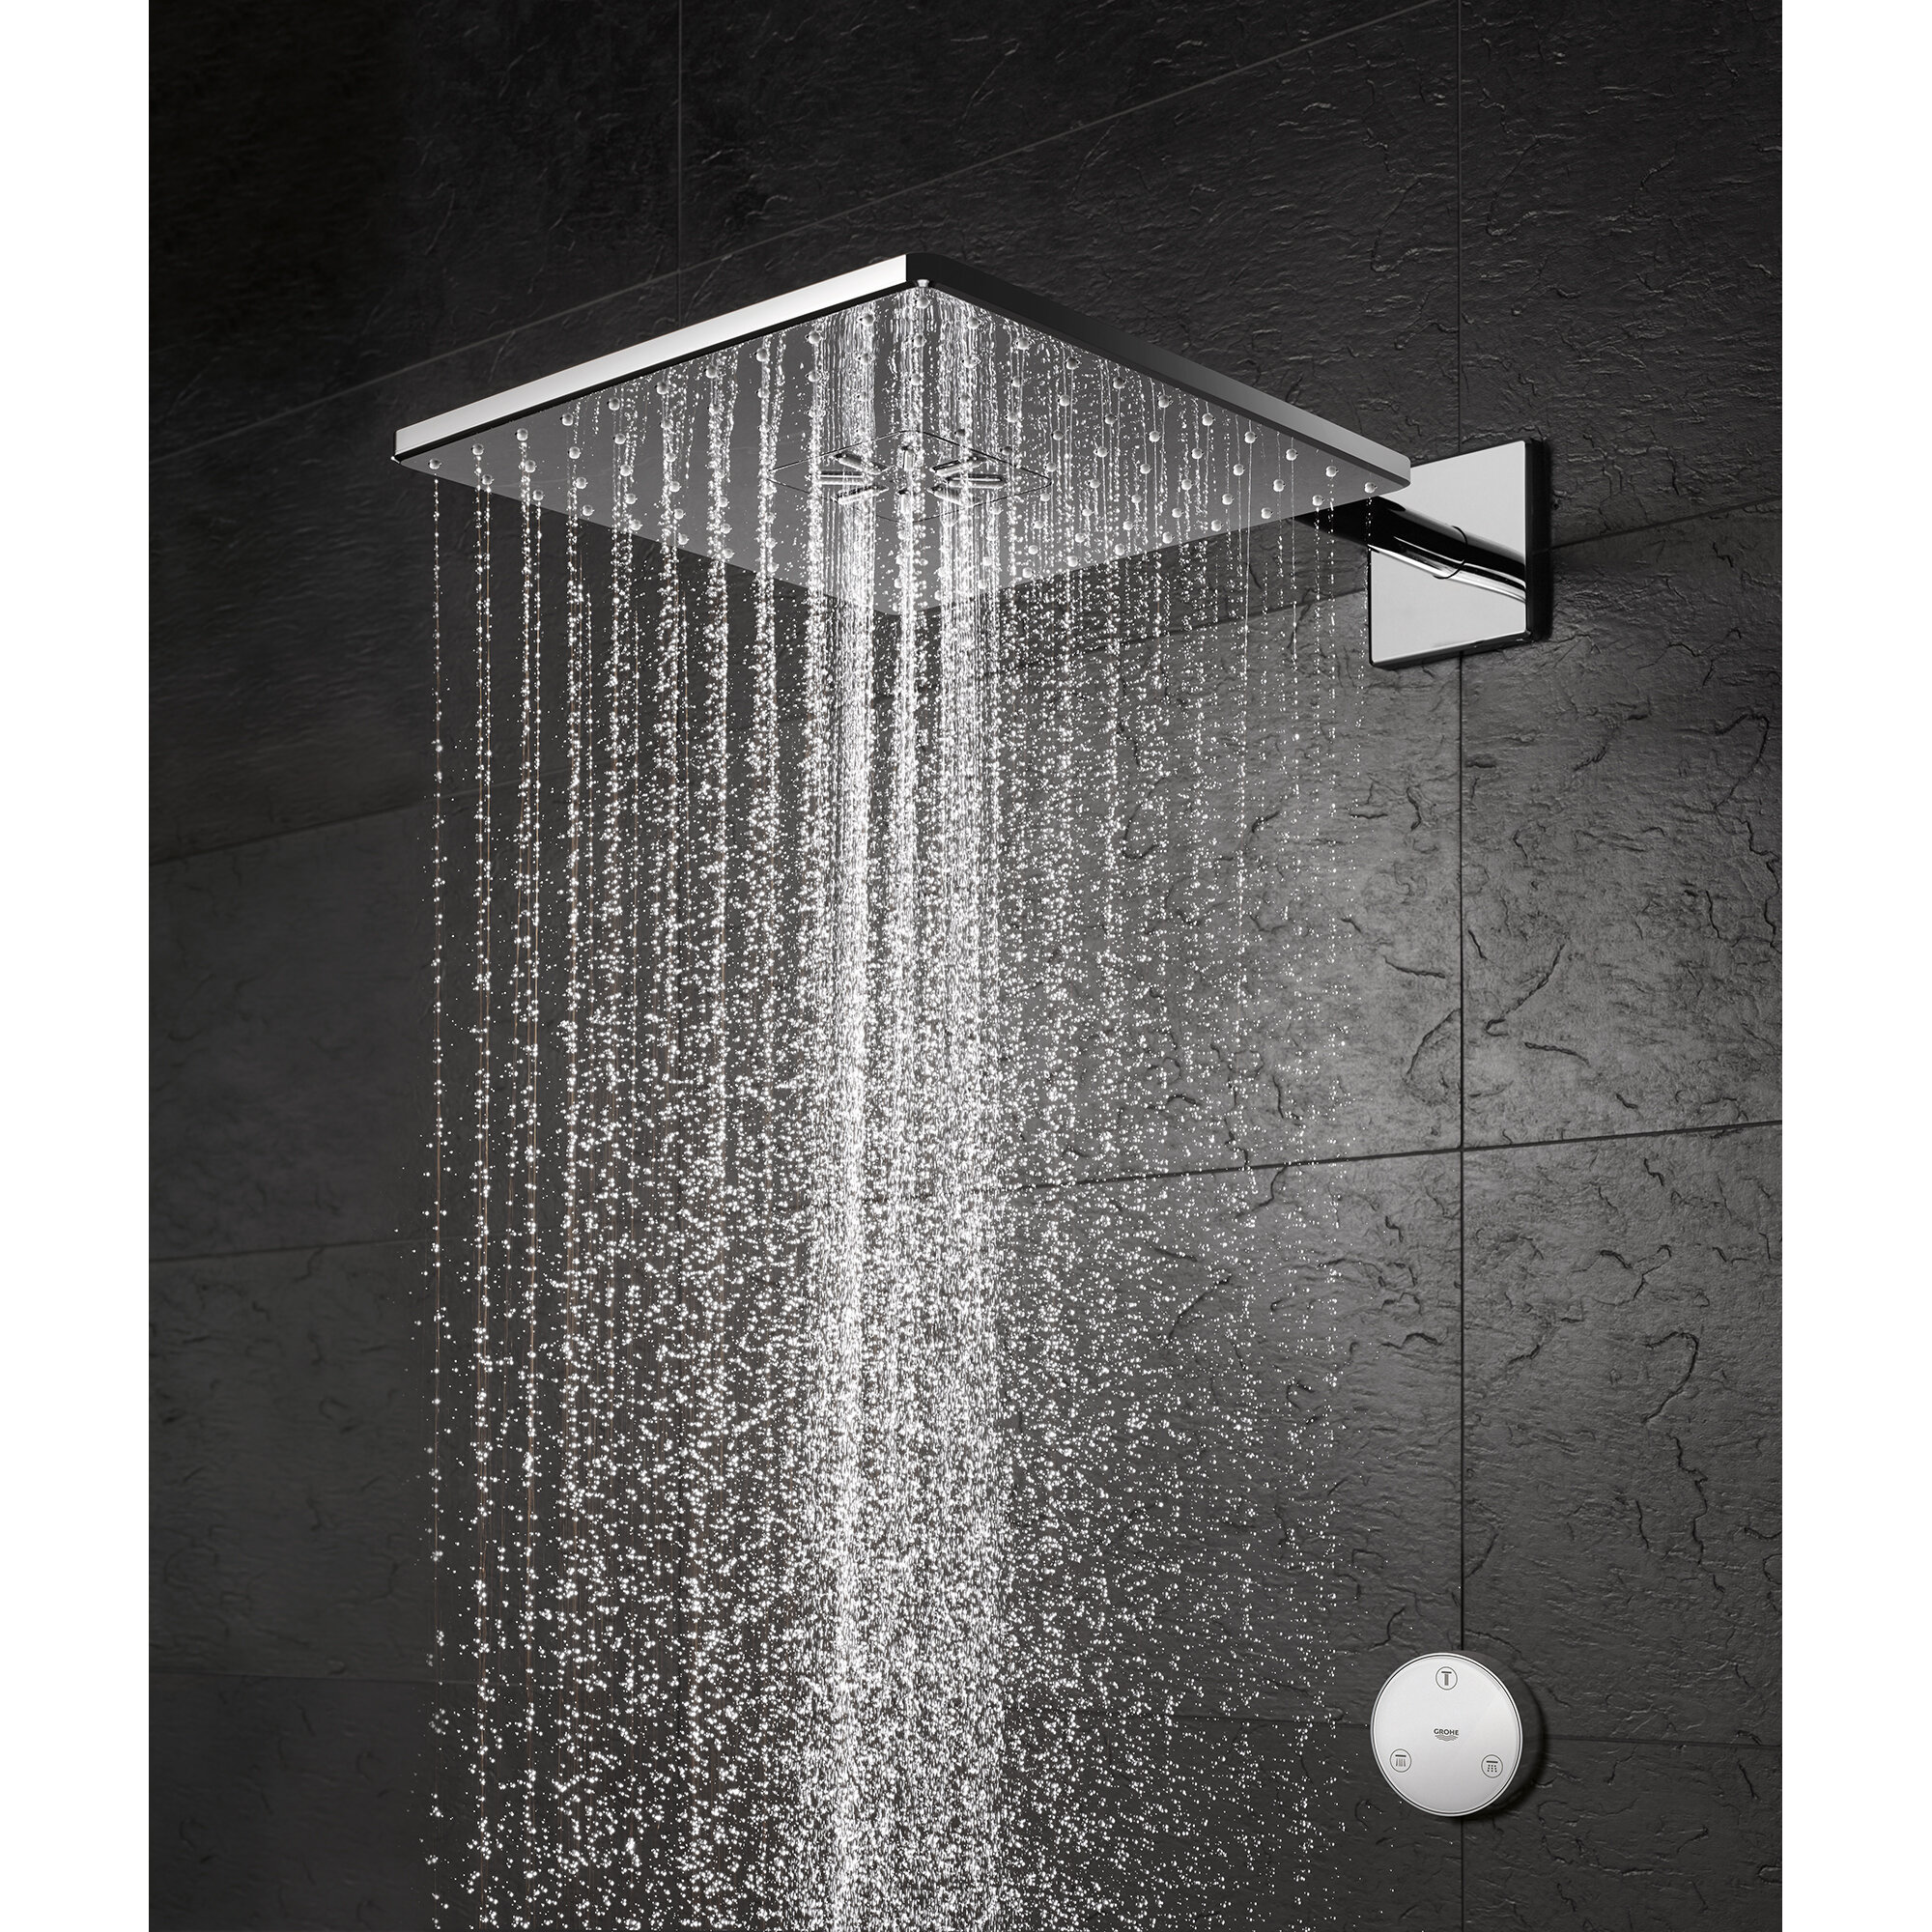 Grohe Rainshower Smartconnect Multi Function Adjustable Shower Head Wayfair